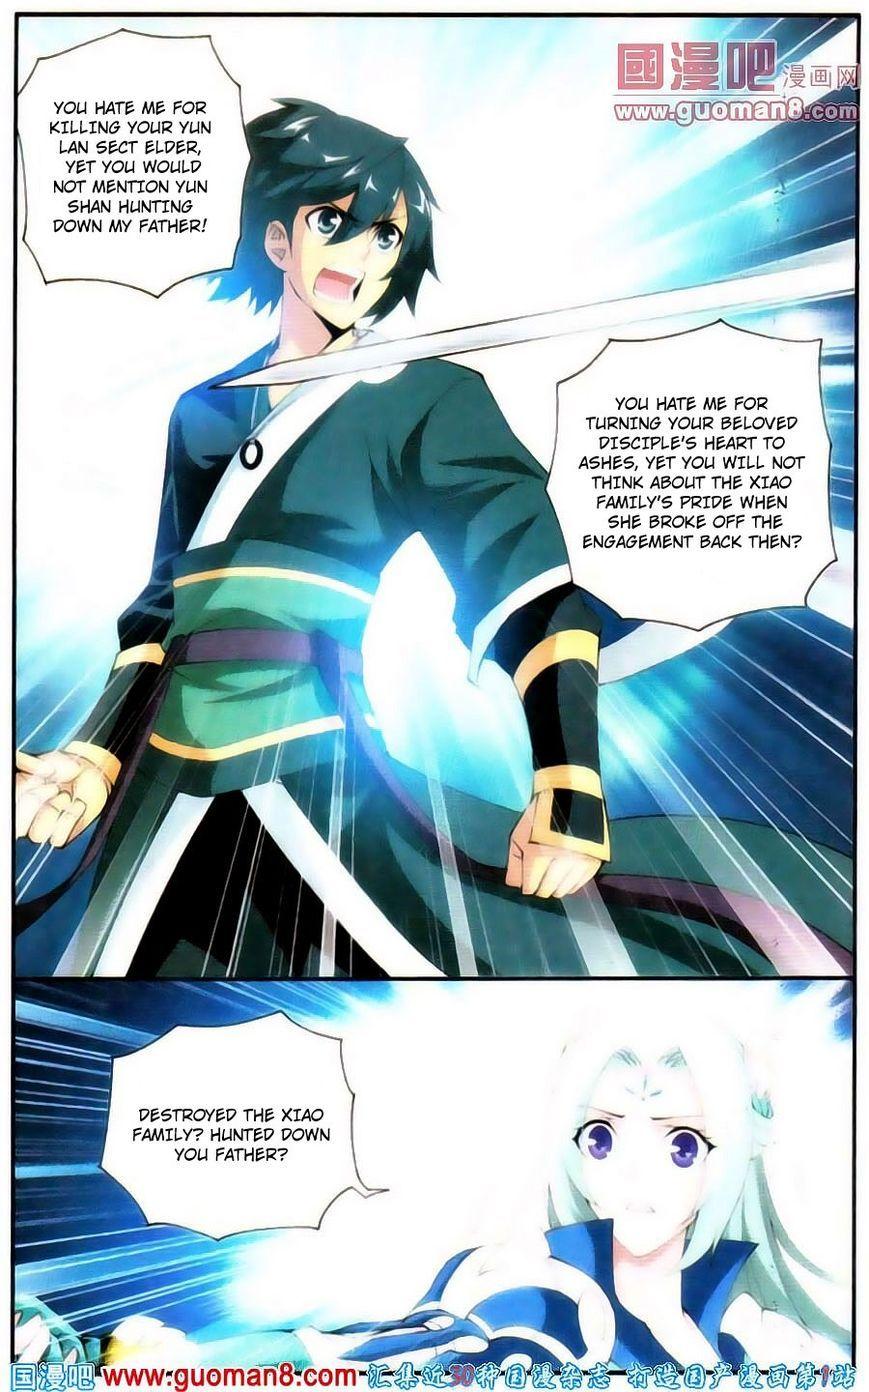 MangaHere Mobile Character, Anime, Battle